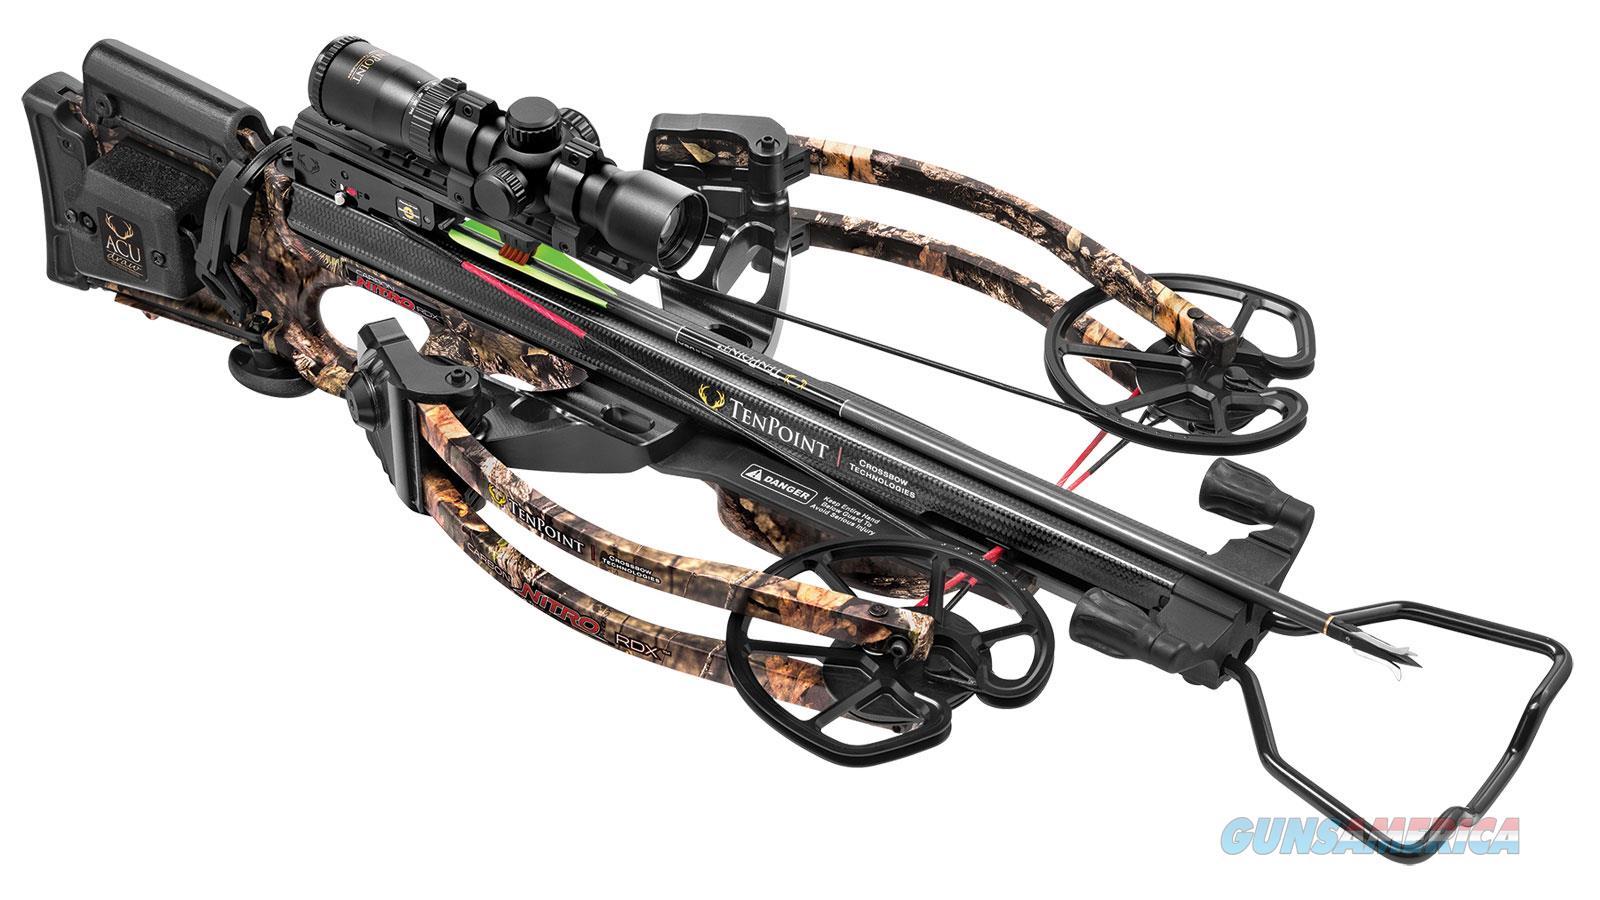 Ten Point Carbon Nitro Rdx Pkg Range CB16005-5412  Non-Guns > Archery > Parts